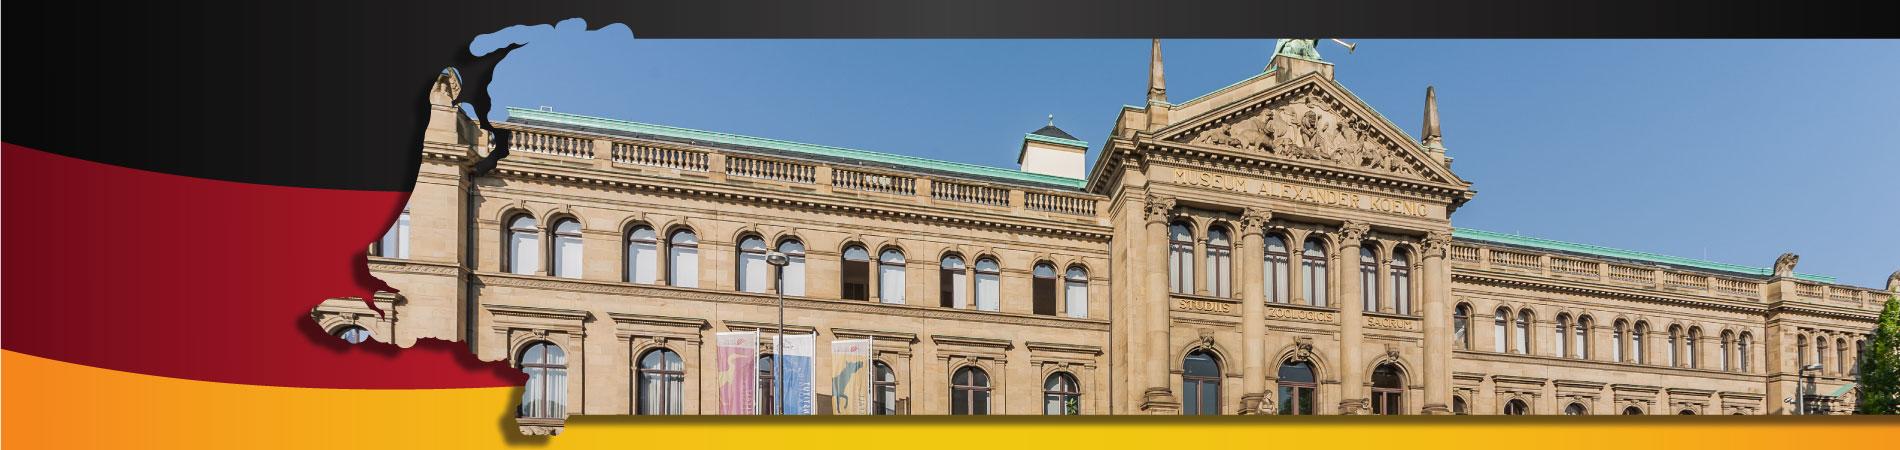 AMS Bonn Museum koenig